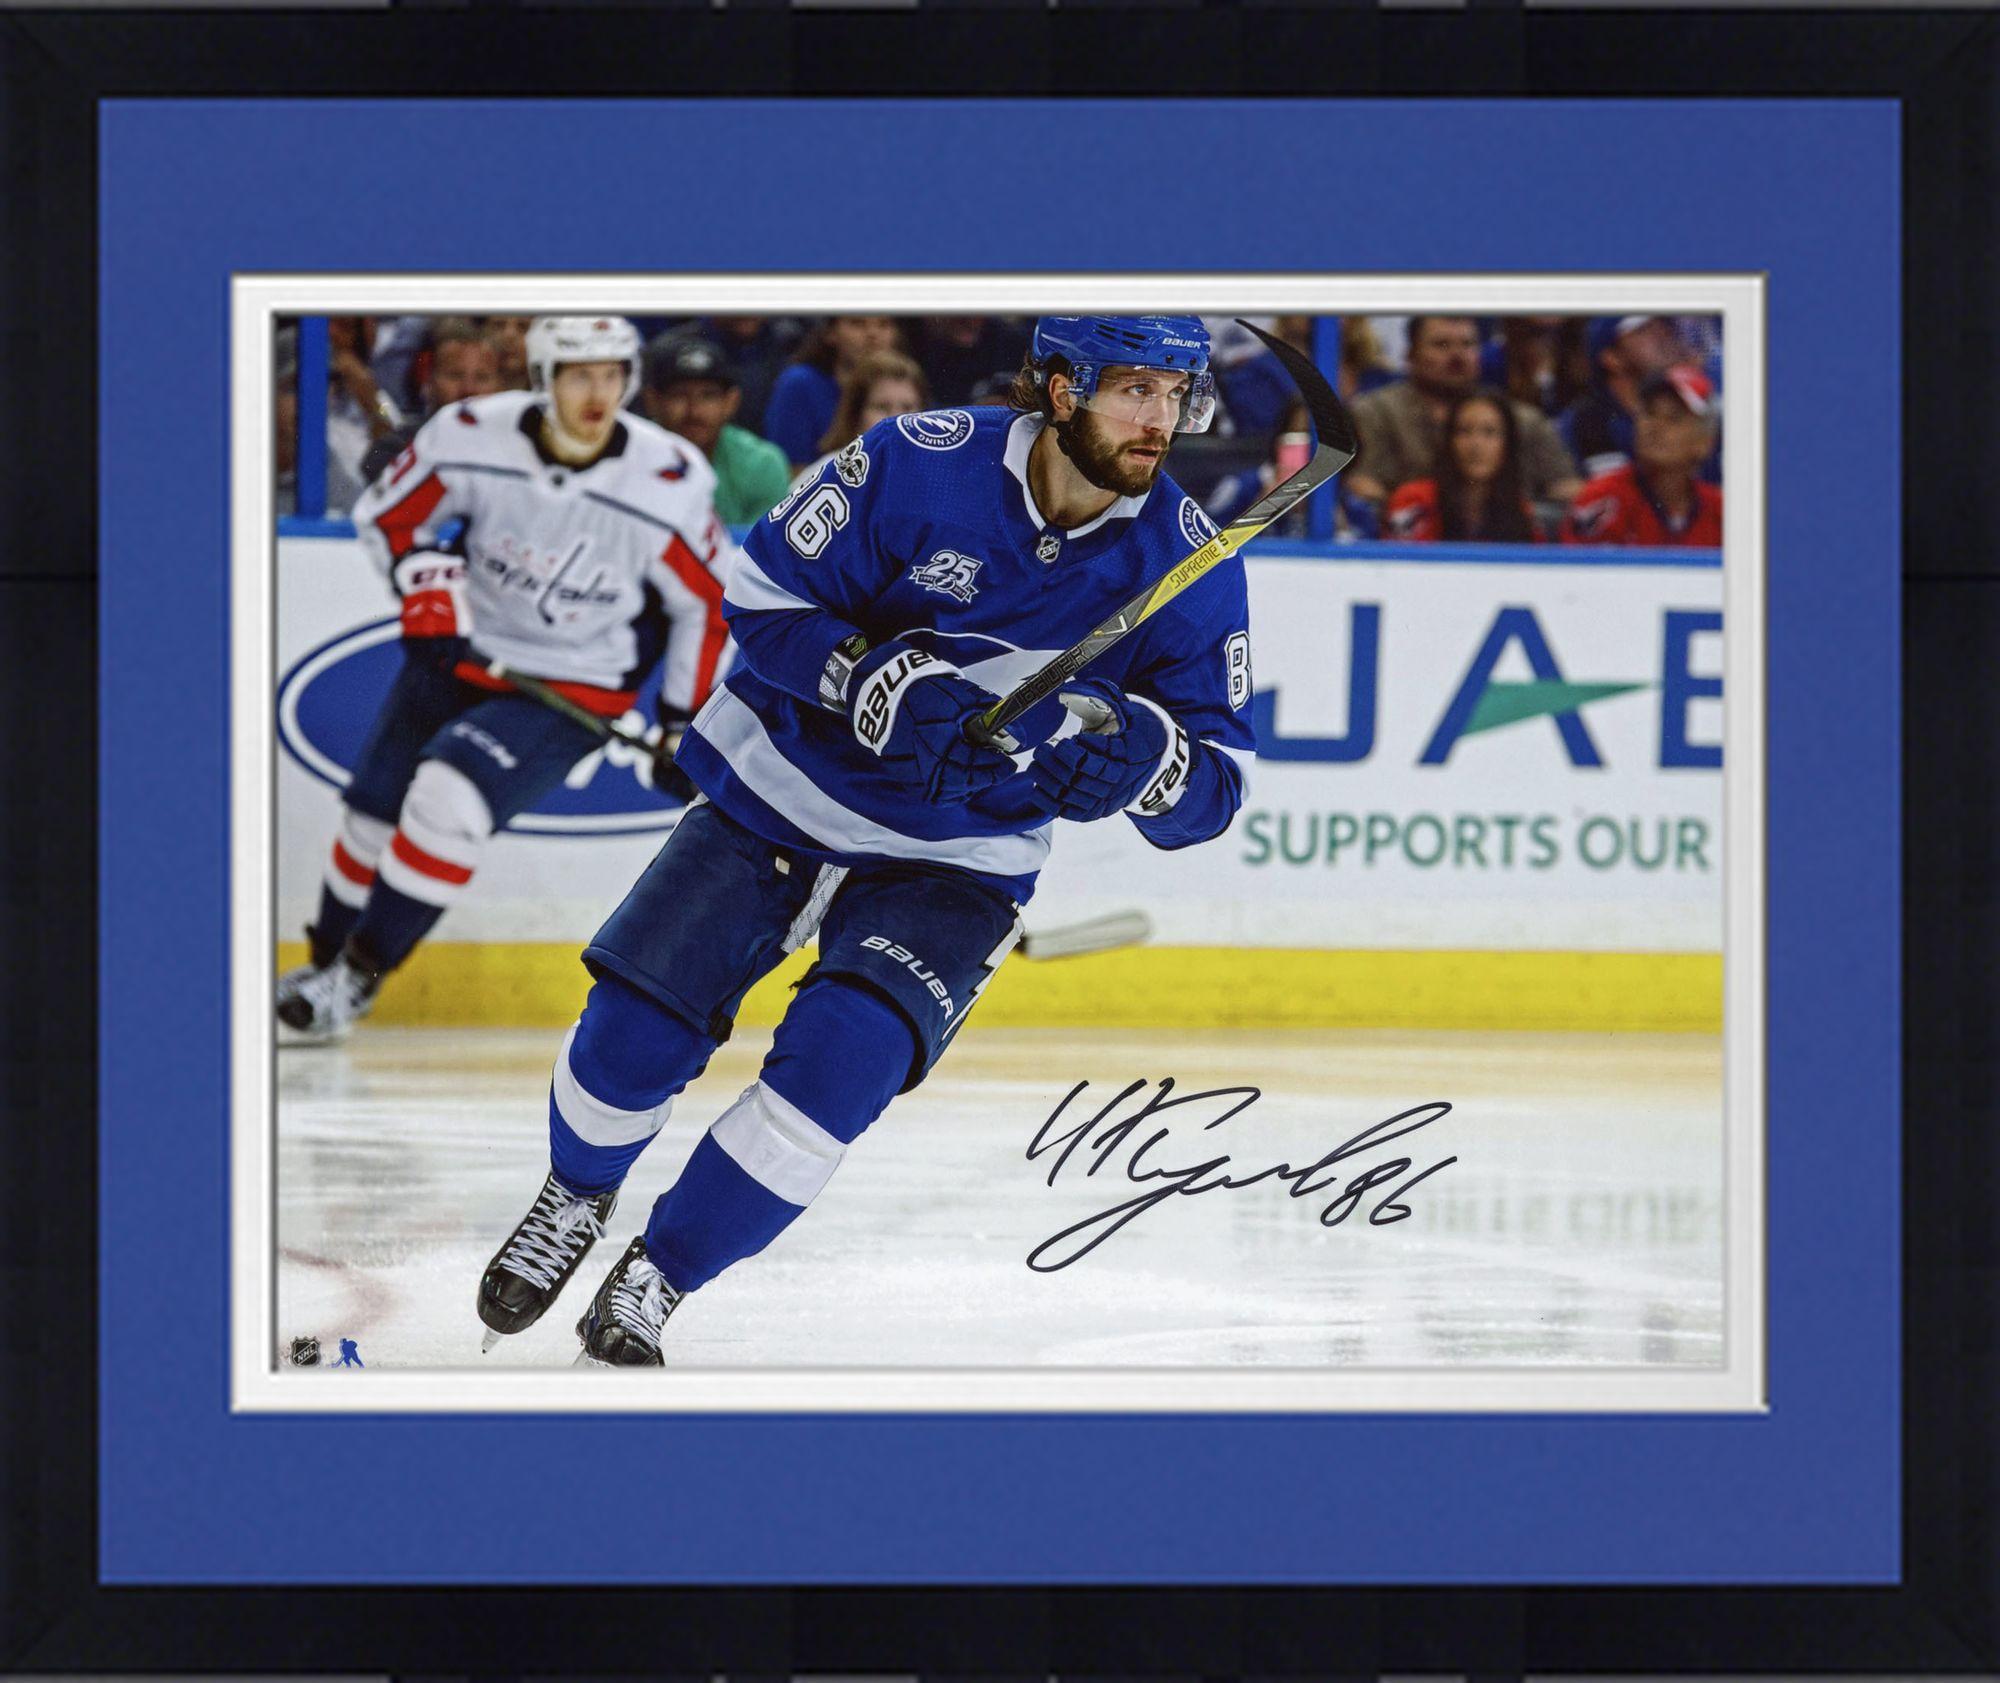 "Framed Nikita Kucherov Tampa Bay Lightning Autographed 8"" x 10"" Blue Jersey Skating Photograph Fanatics... by Fanatics Authentic"